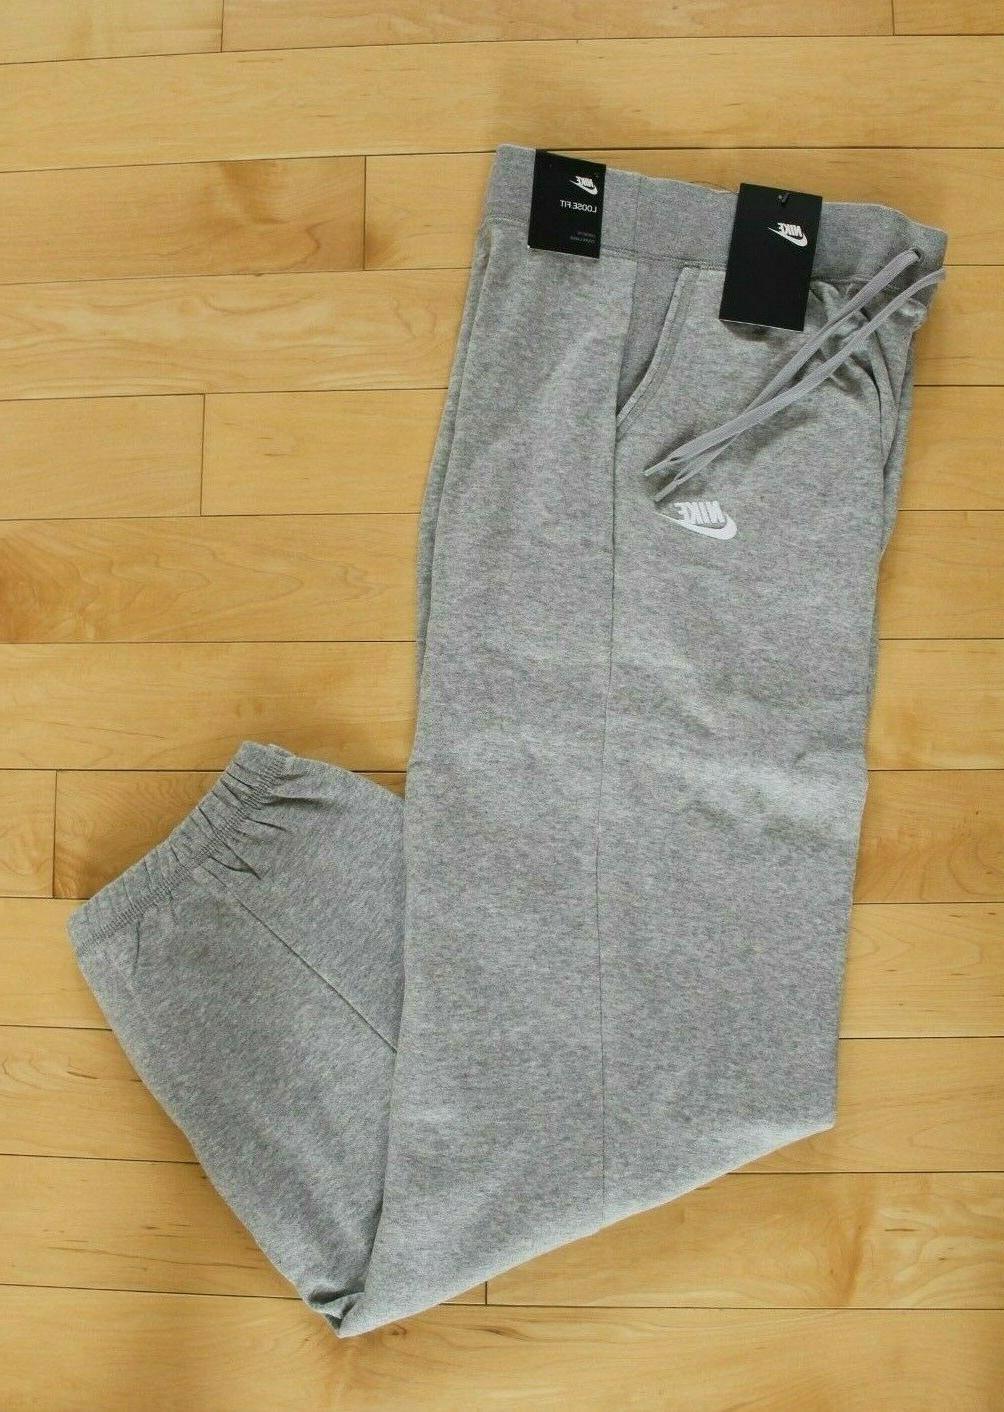 NWT NIKE Sportswear Fit Jogger Sweatpants M